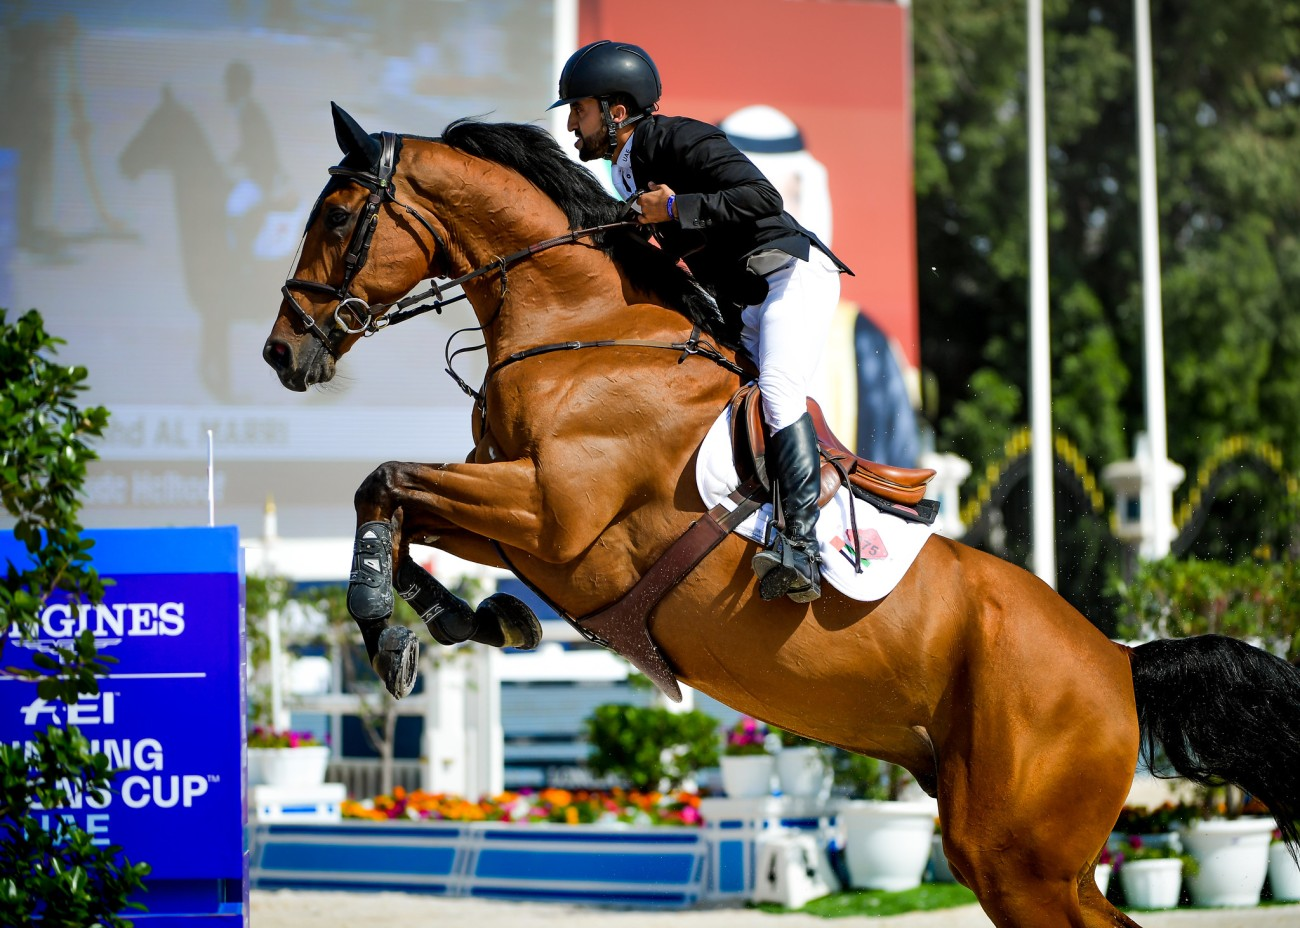 2020.03.01.99.99 Abu Dhabi CSIO 5 FEI NC Abullah Mohd Al Marri & James vd Oude Heihoef FEI Helen Cruden